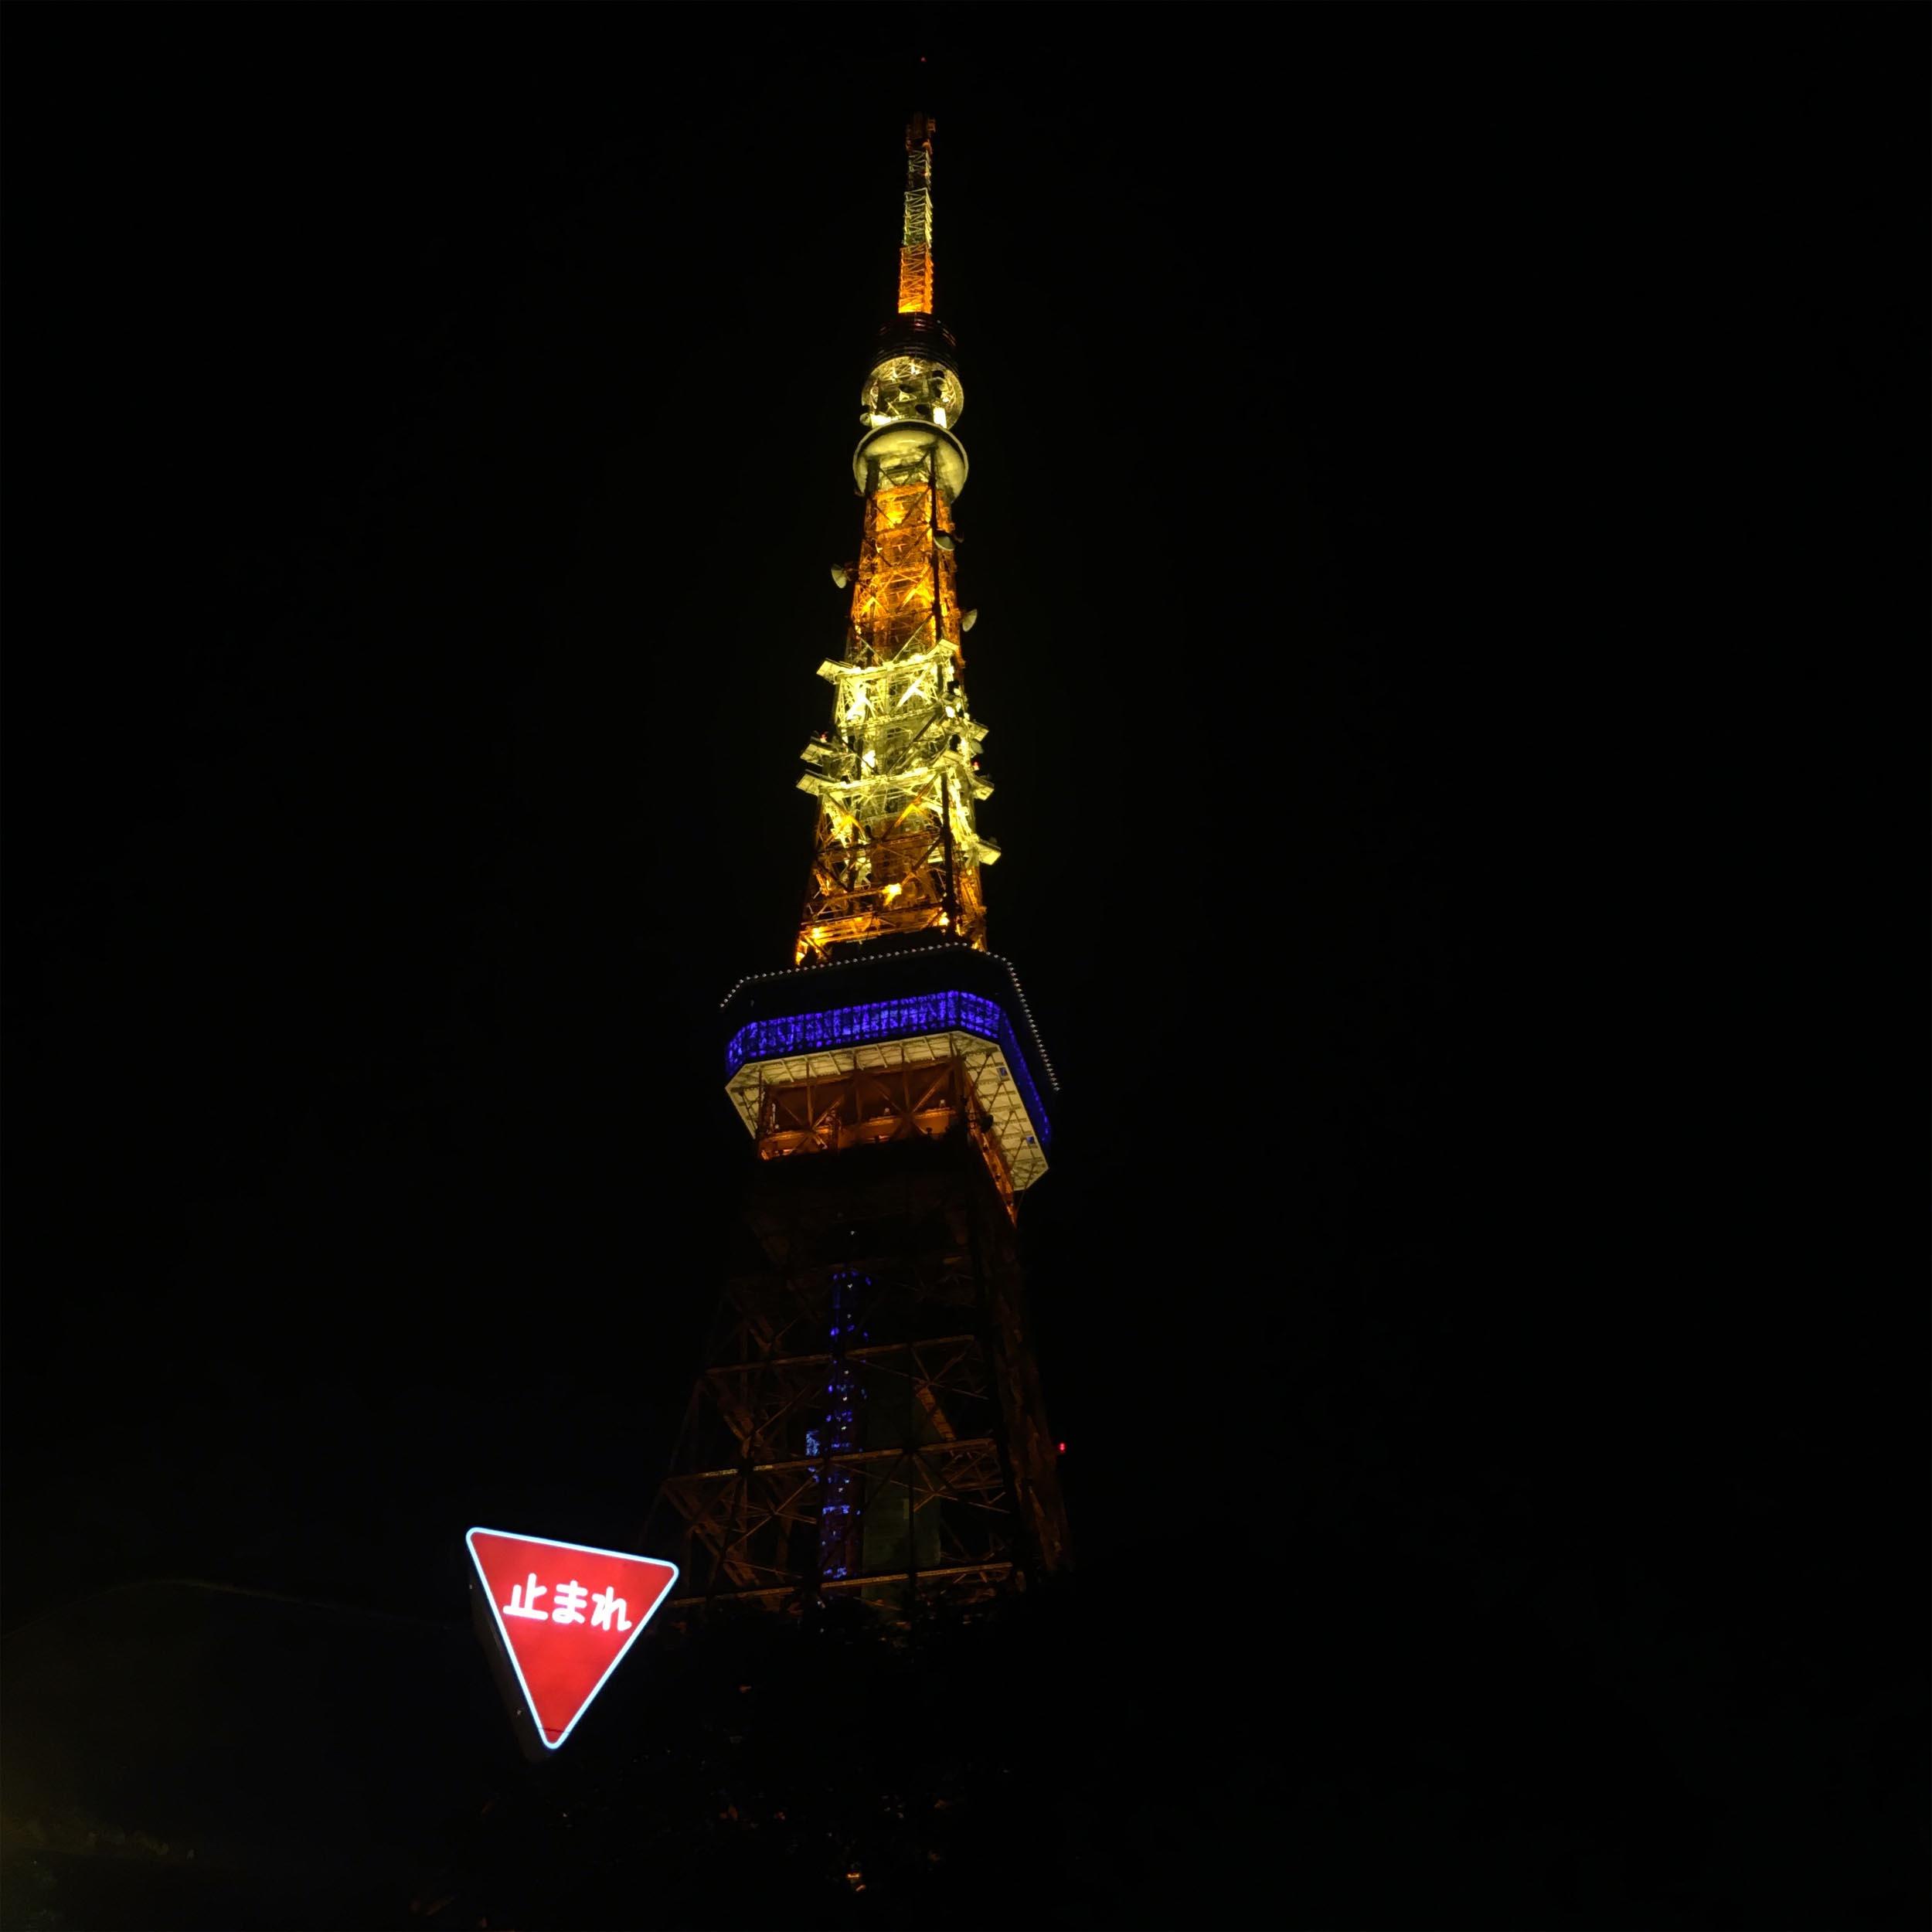 #TOKYO TOWER / TOKYO MINATO / JAPAN / 2016